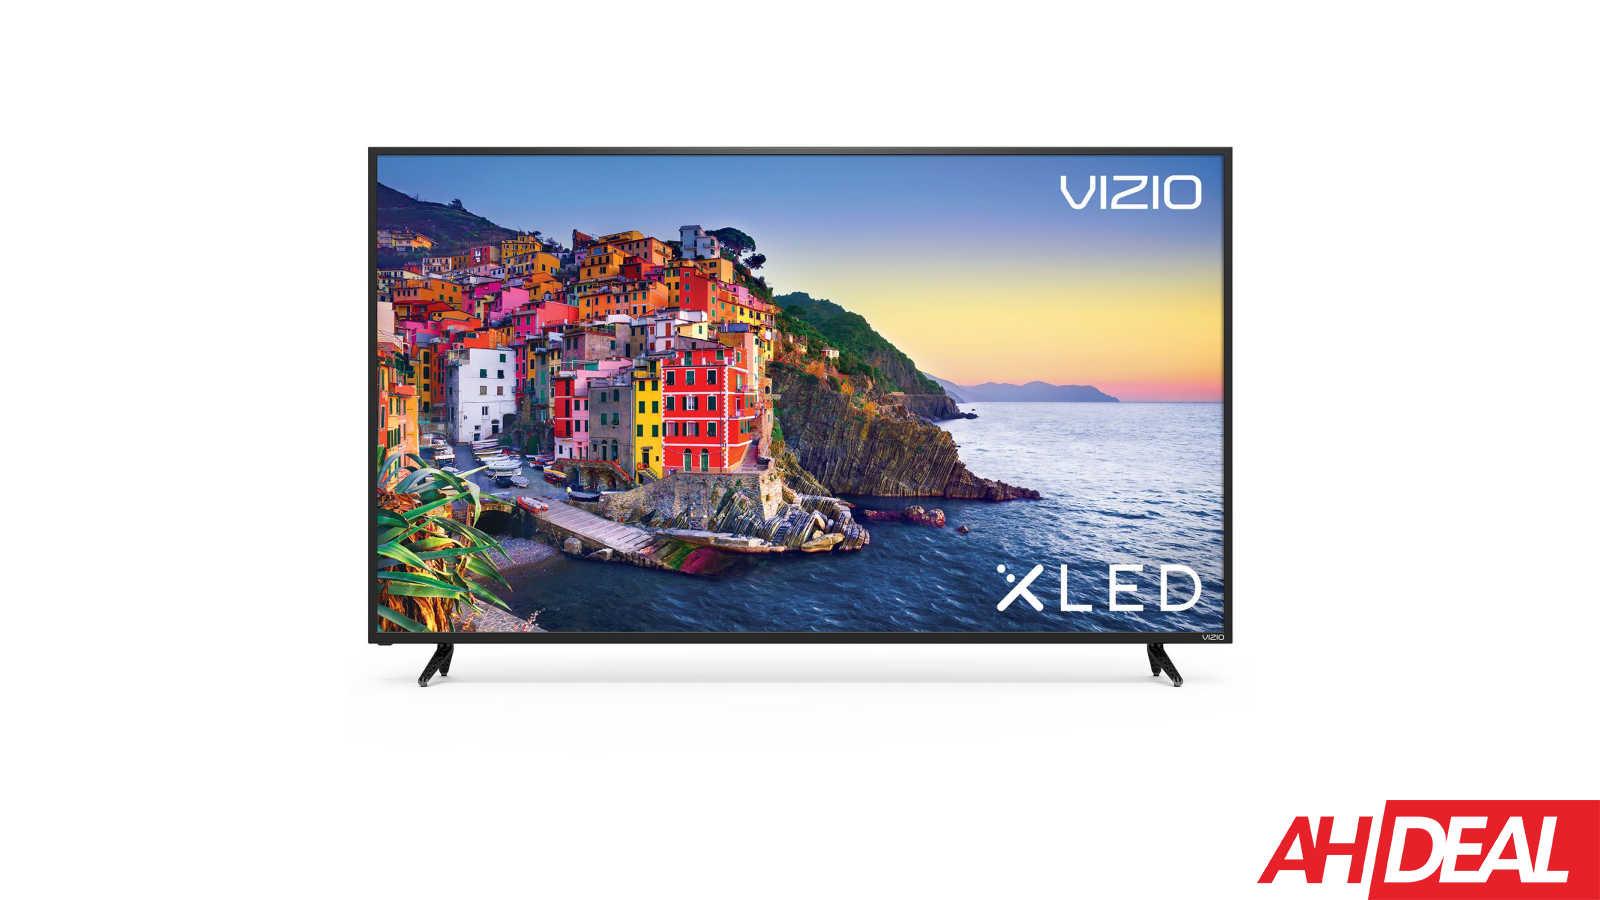 VIZIO's 80-inch 4K TV Brings Chromecast Home For $1599 From Sam's Club